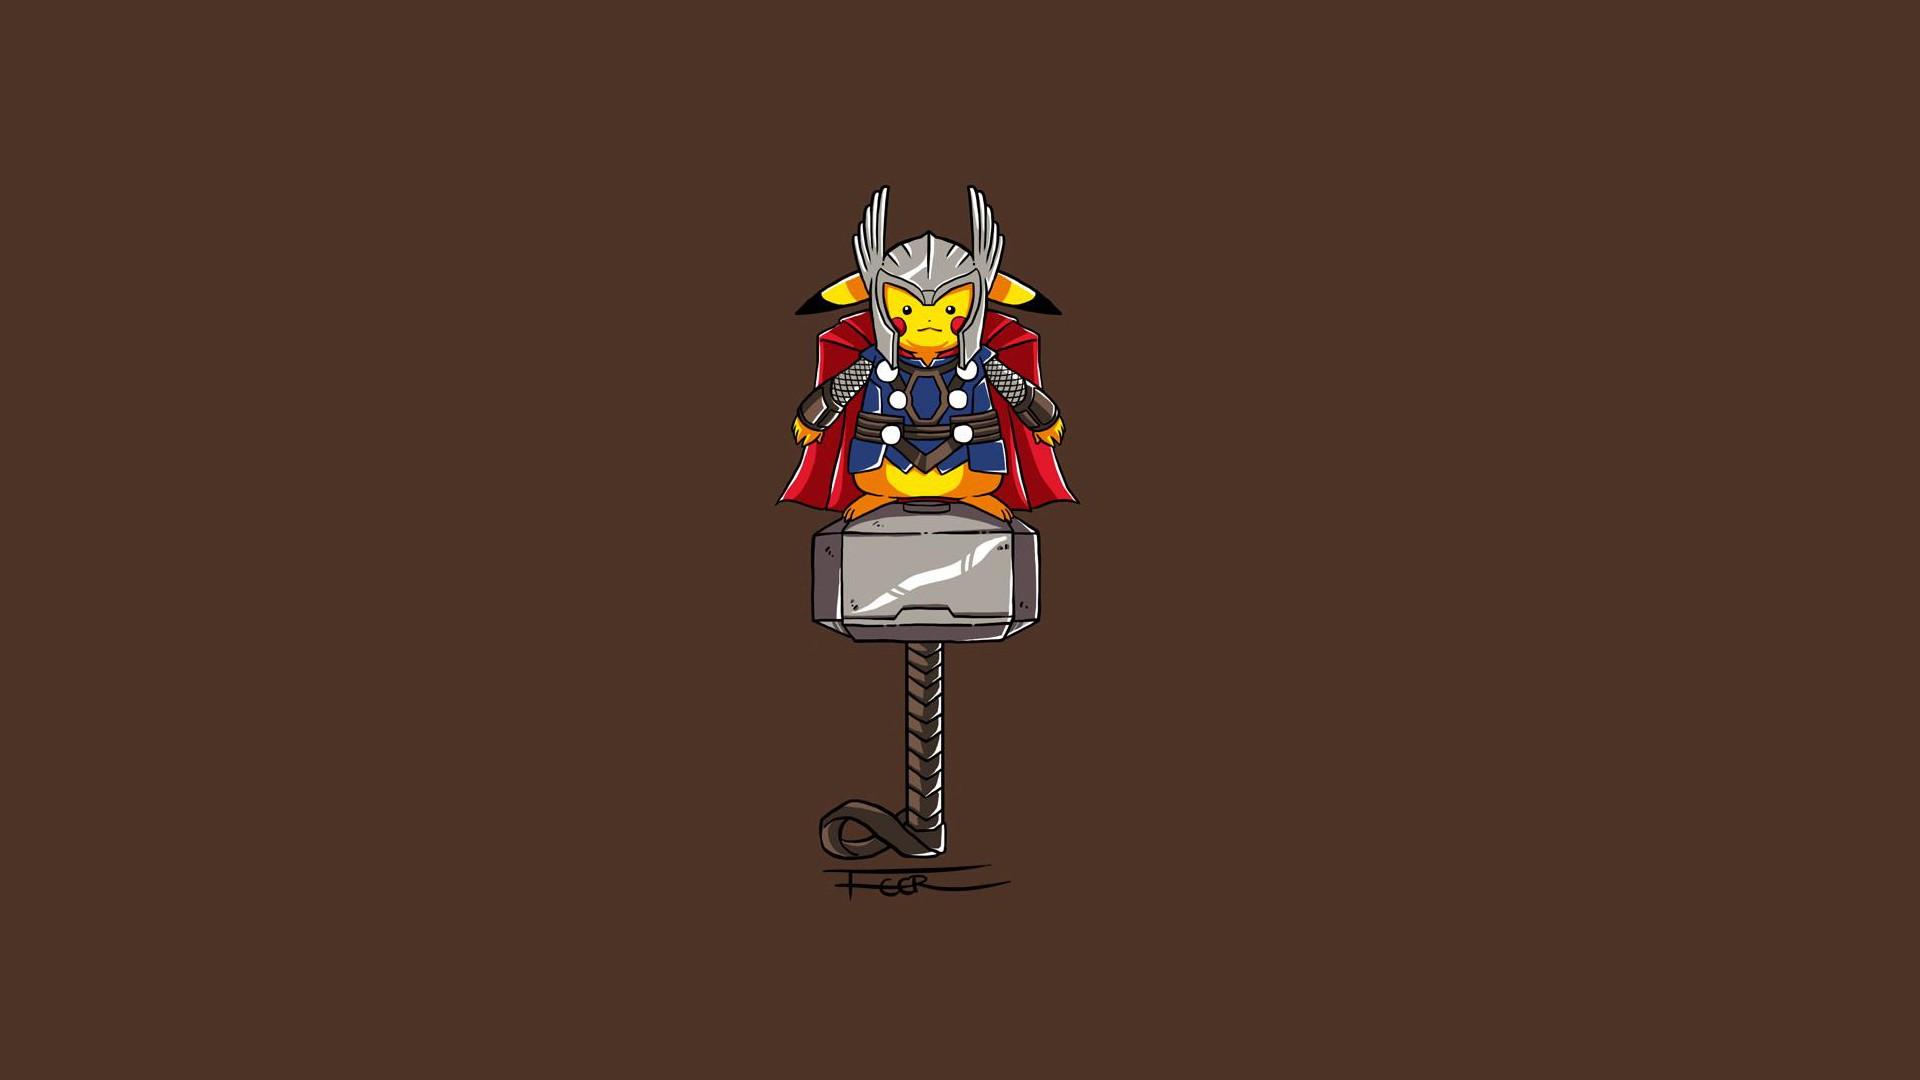 Free Thor Wallpaper HD for Desktop (15)